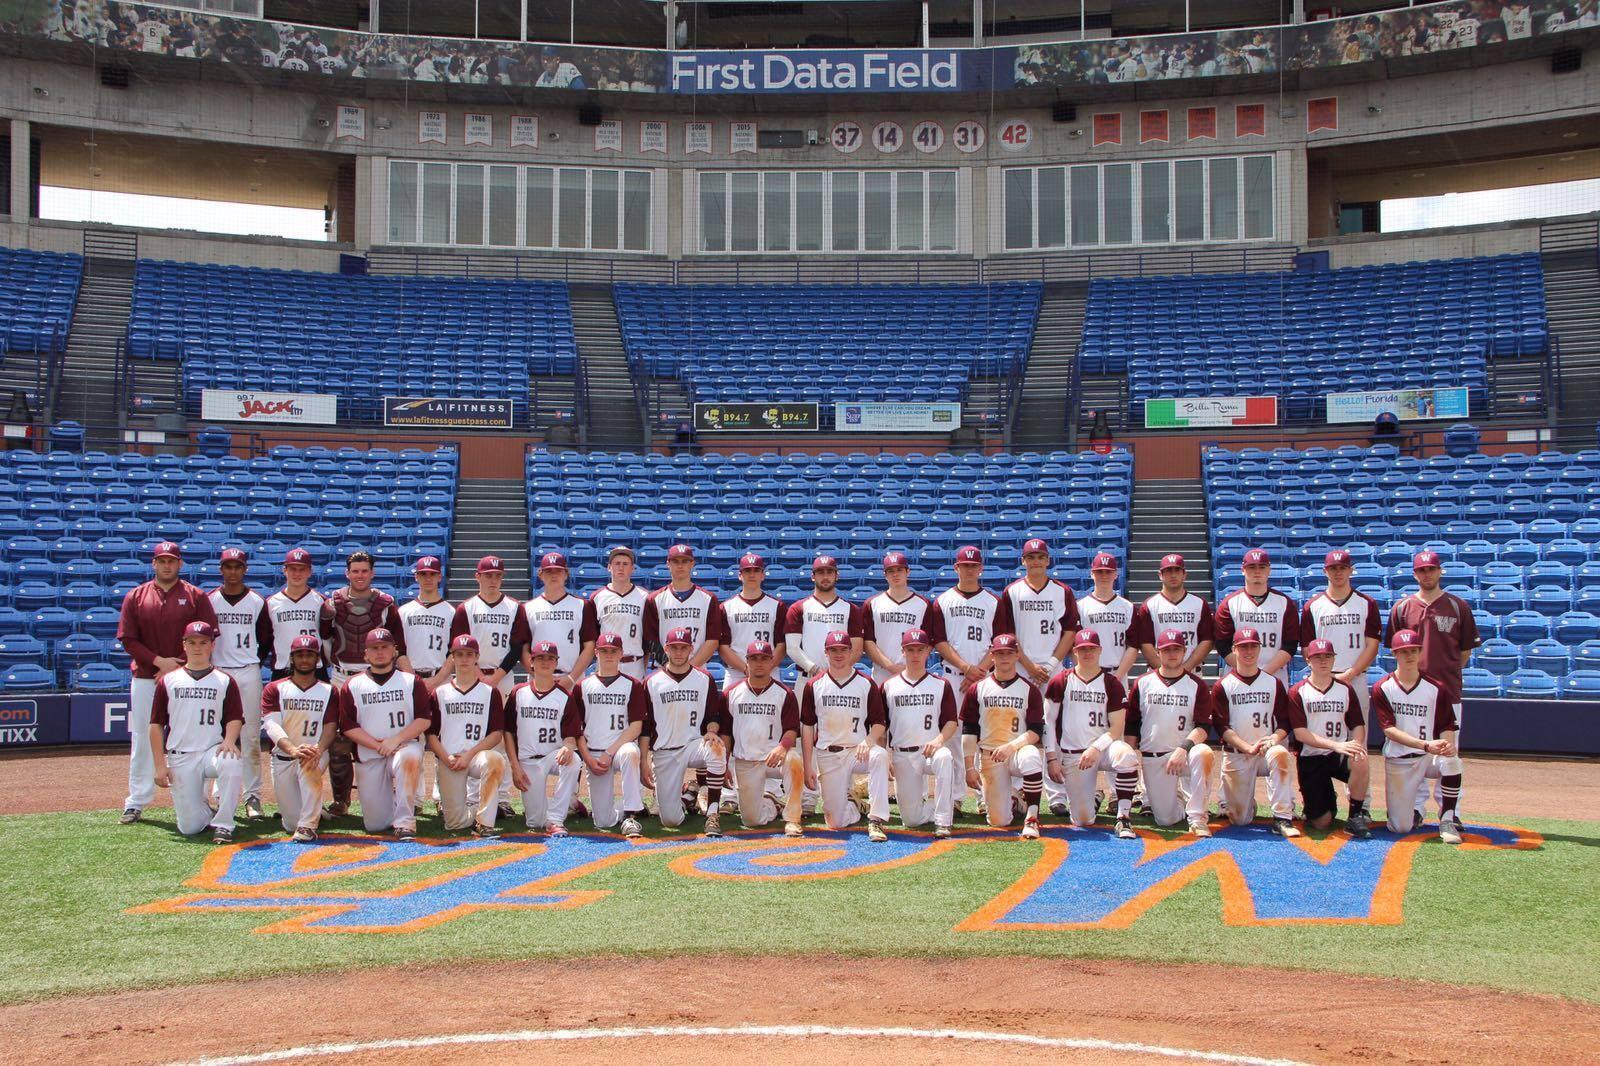 Championship baseball team